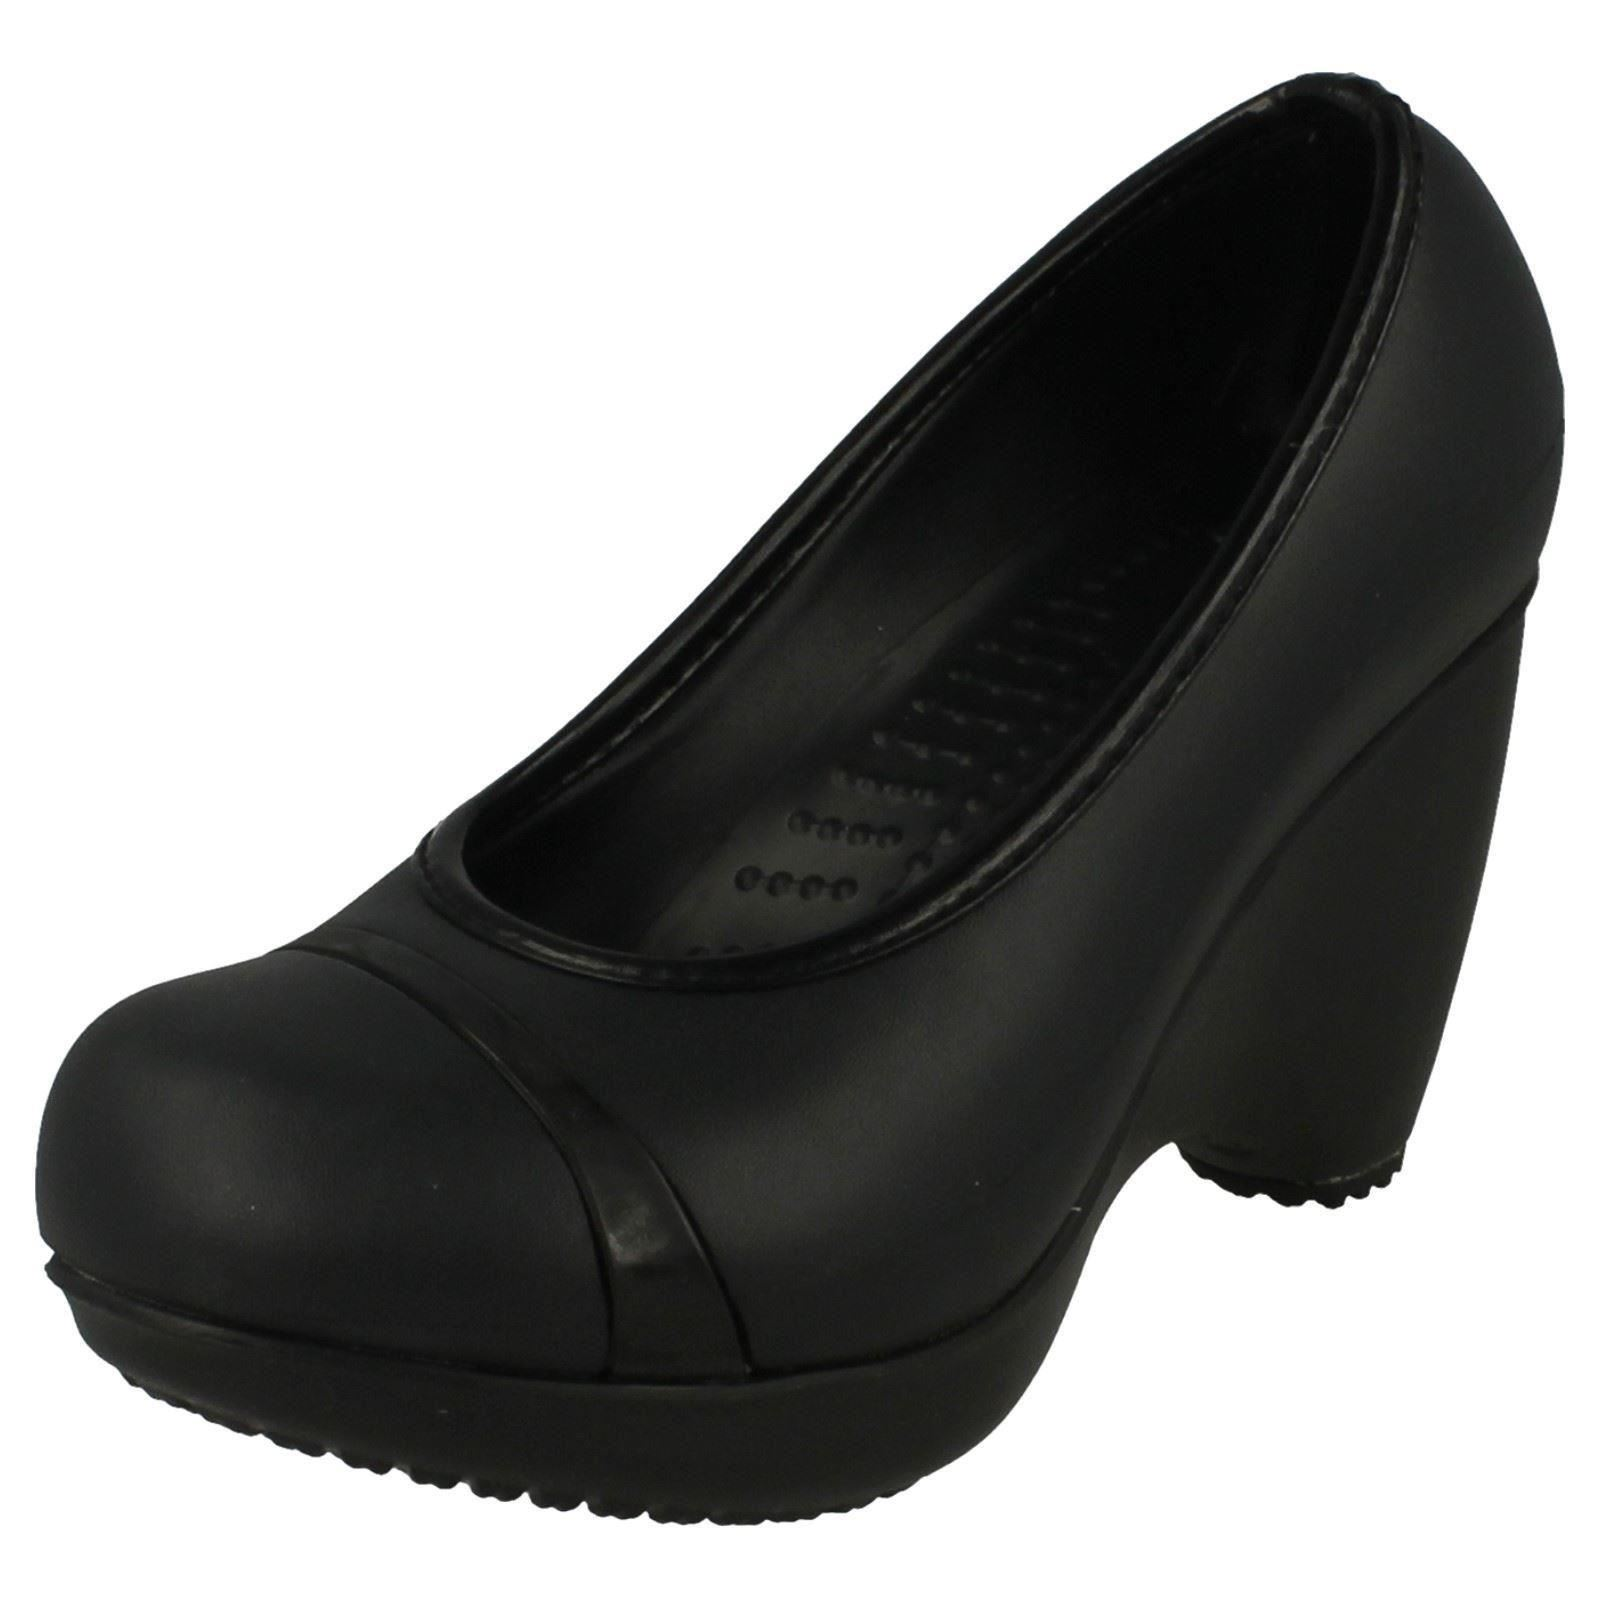 Ladies Crocs Wedge Heel Shoes 'Lena' | eBay